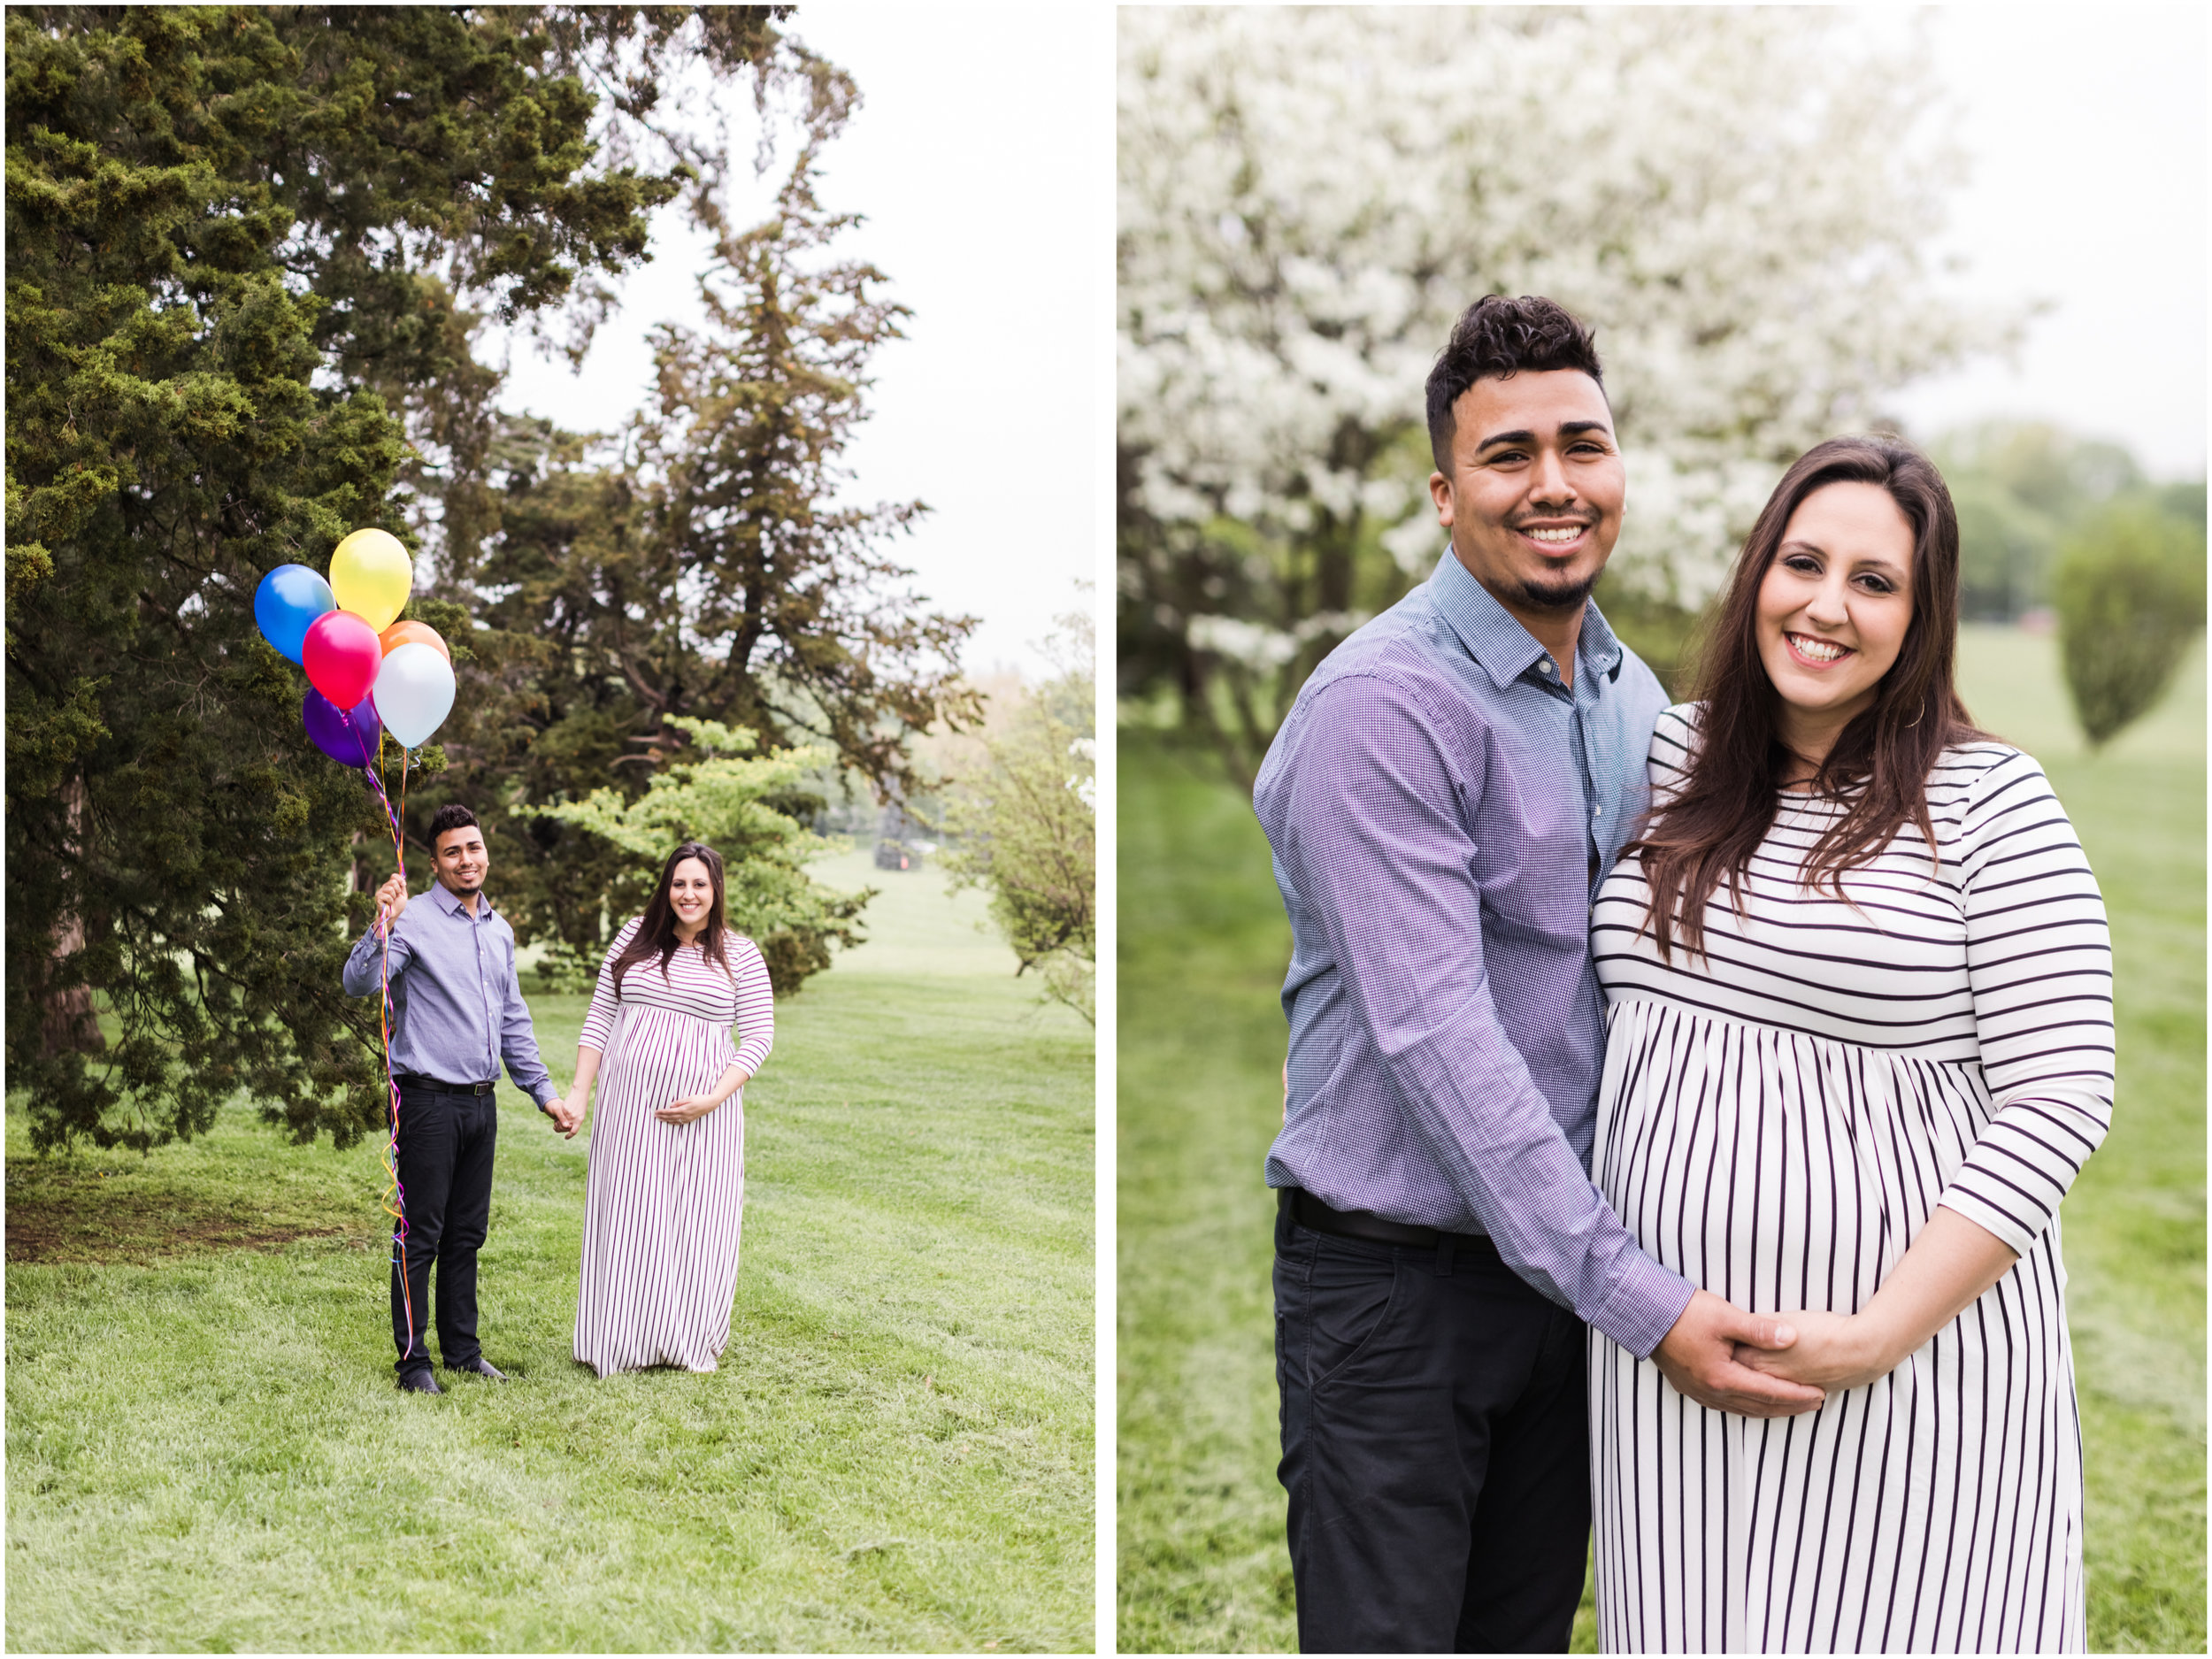 Kansas City Maternity Photos 2.jpg